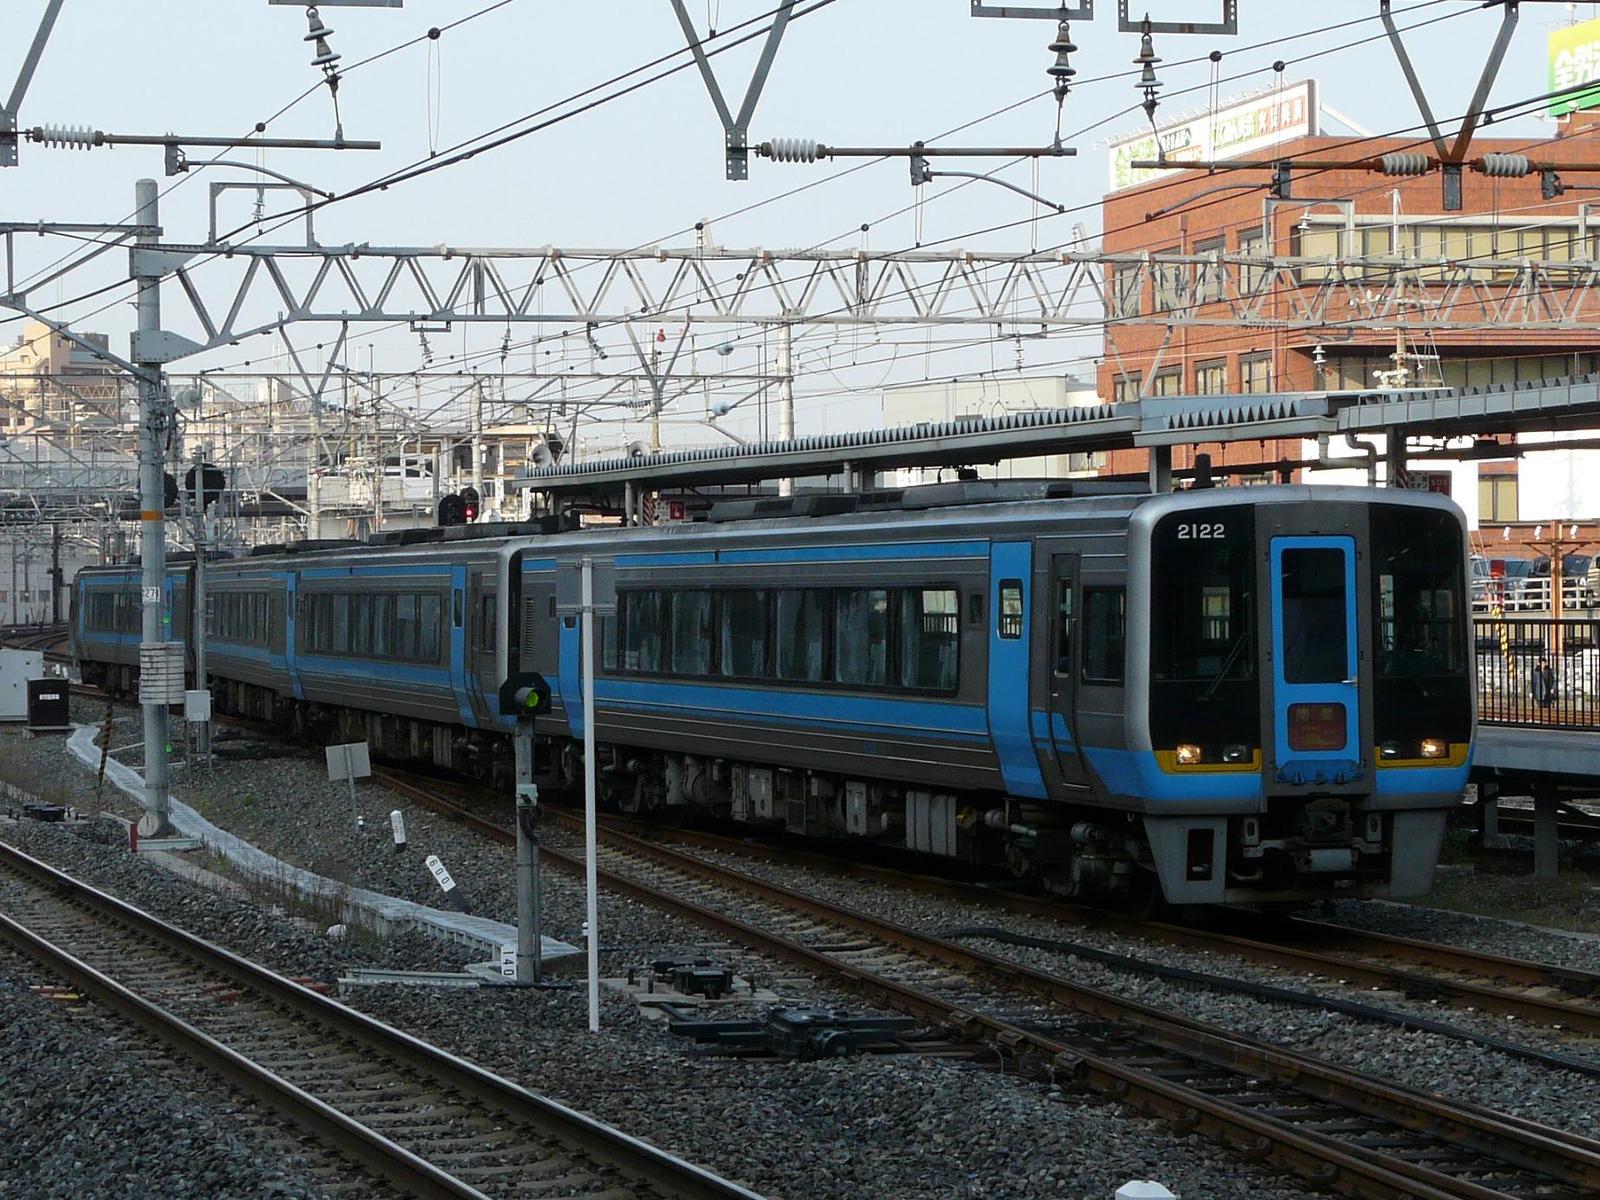 P1180903